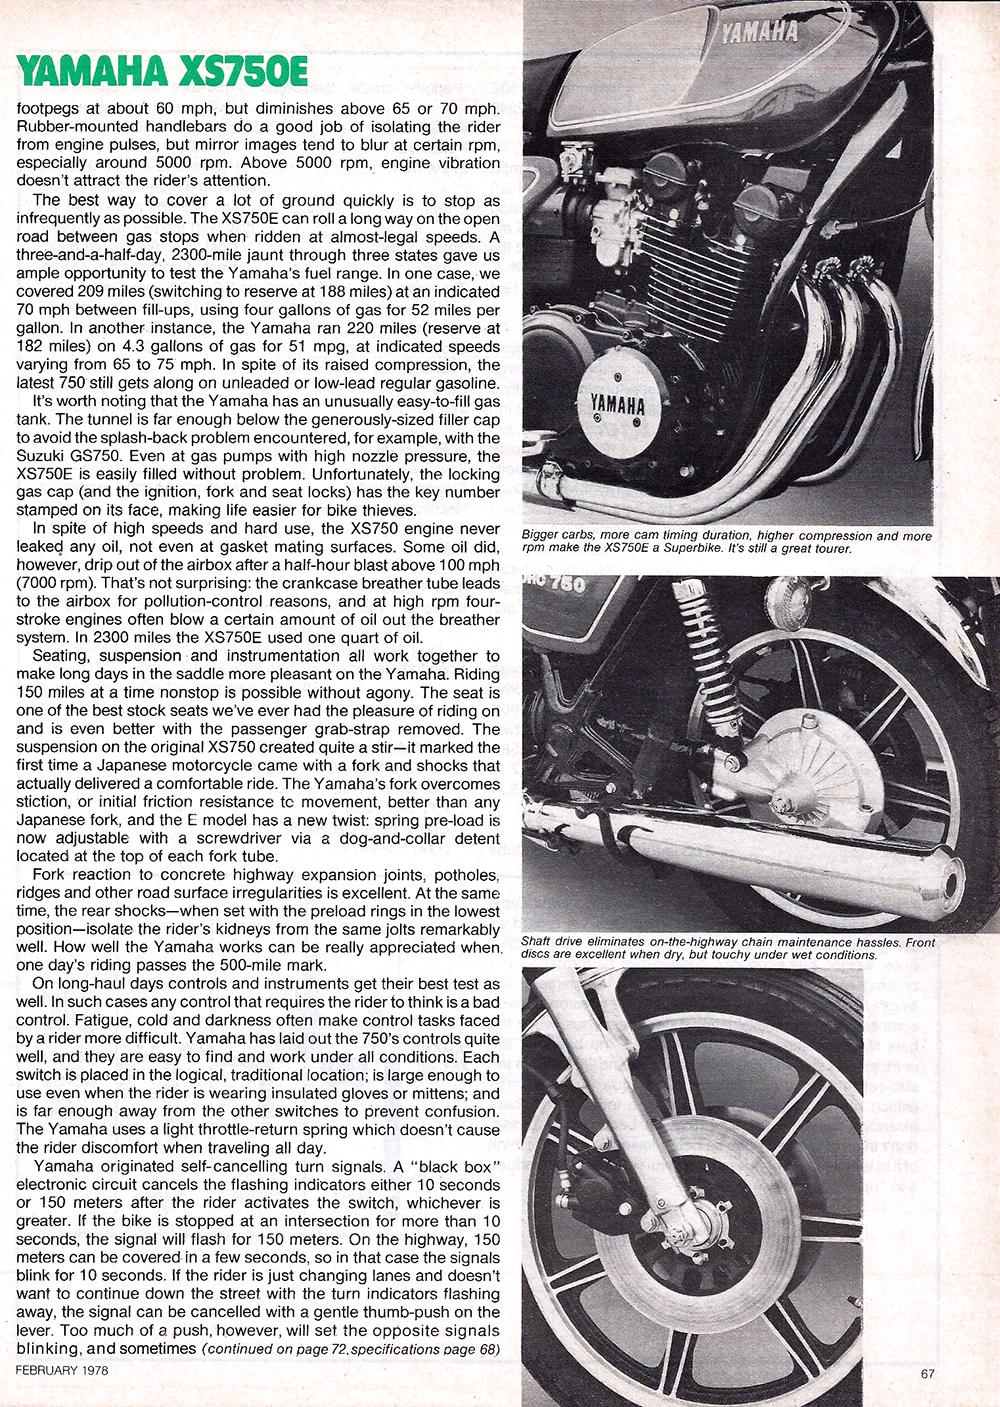 1978 Yamaha XS750E road test 4.jpg